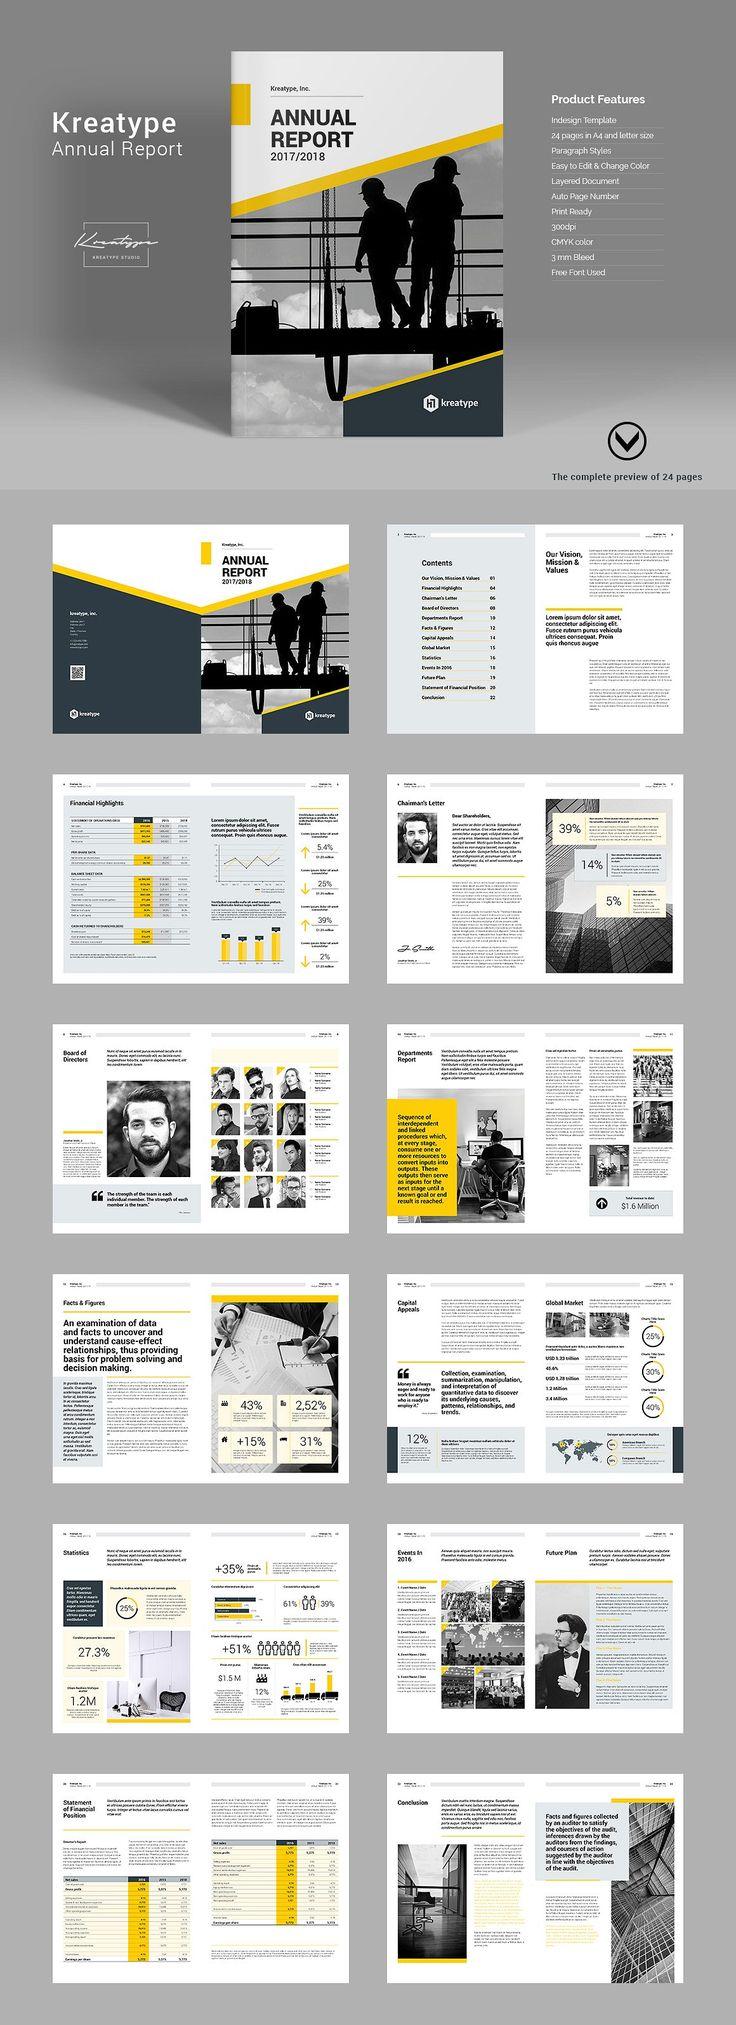 Kreatype Annual Report by Kreatype Studio on @creativemarket